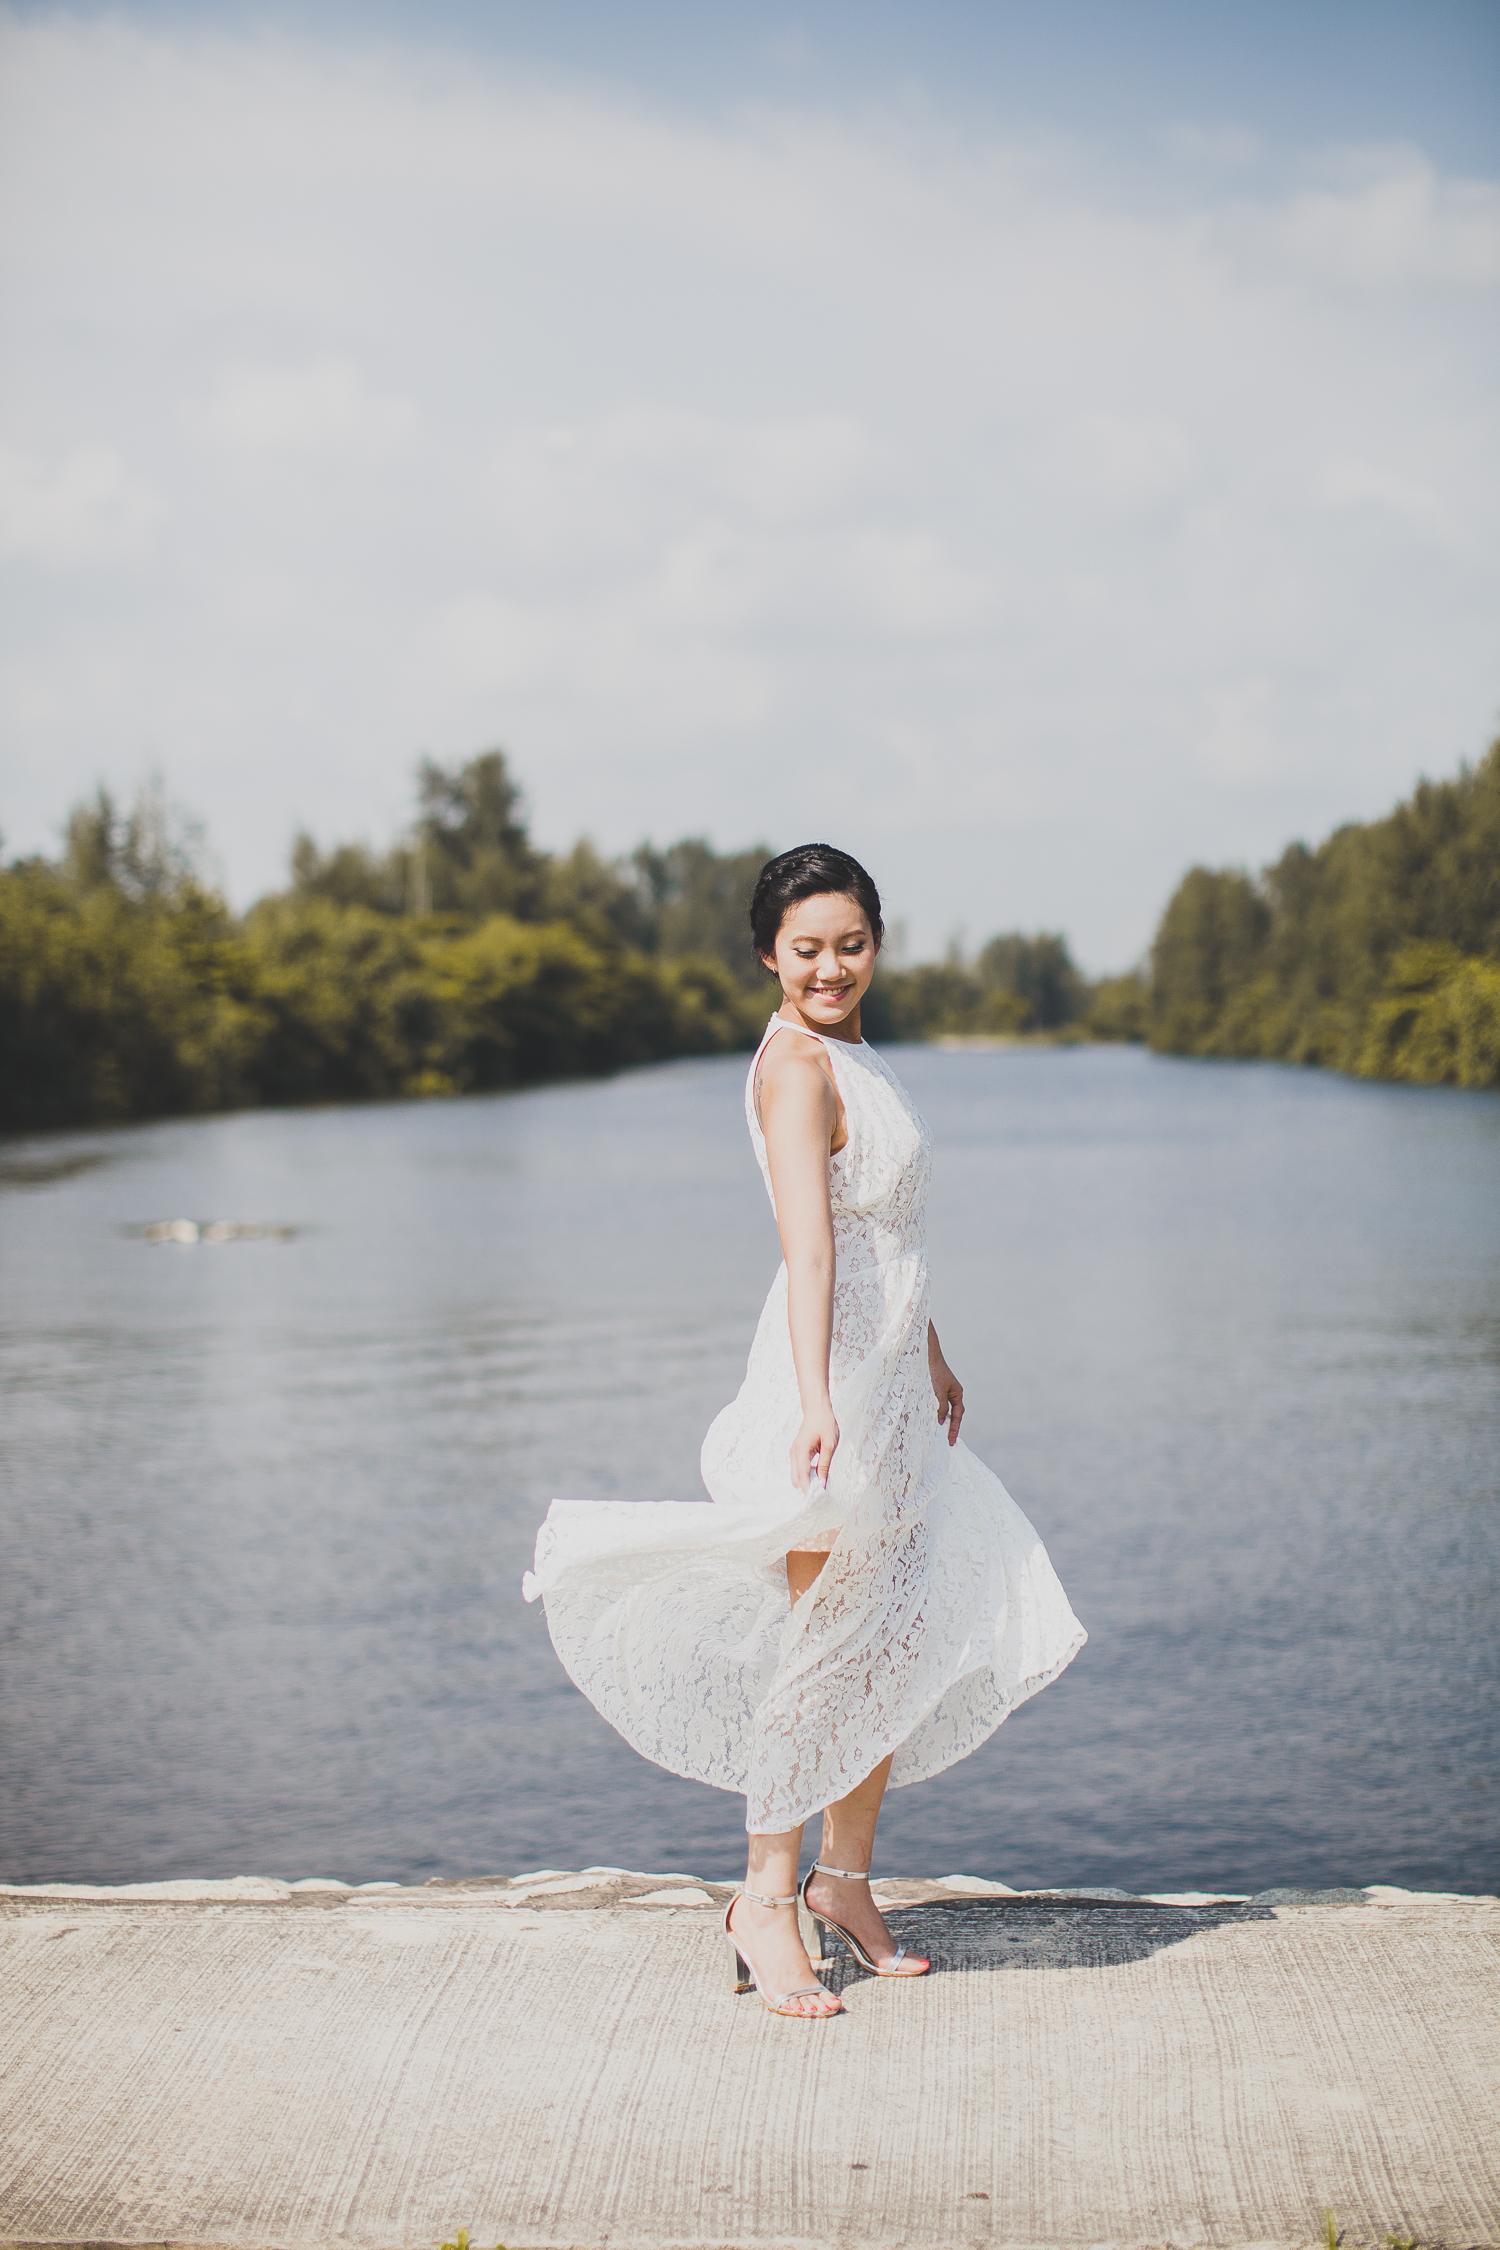 Singapore+Pre+Wedding+Photographer+Ziyang+Clara-0042.jpg